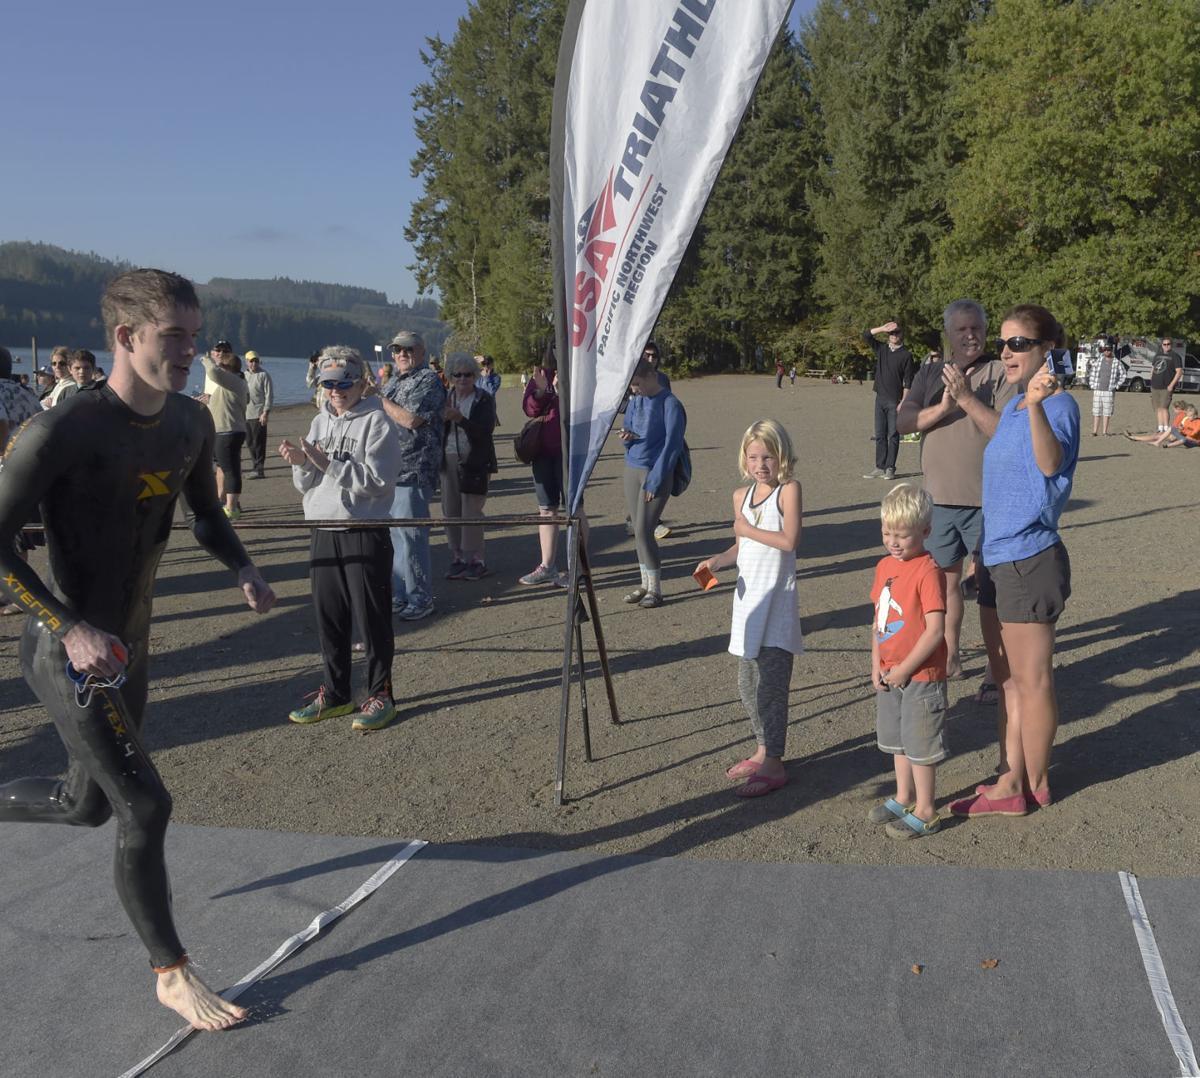 091415-adh-spt-triathlon-04-ej.JPG